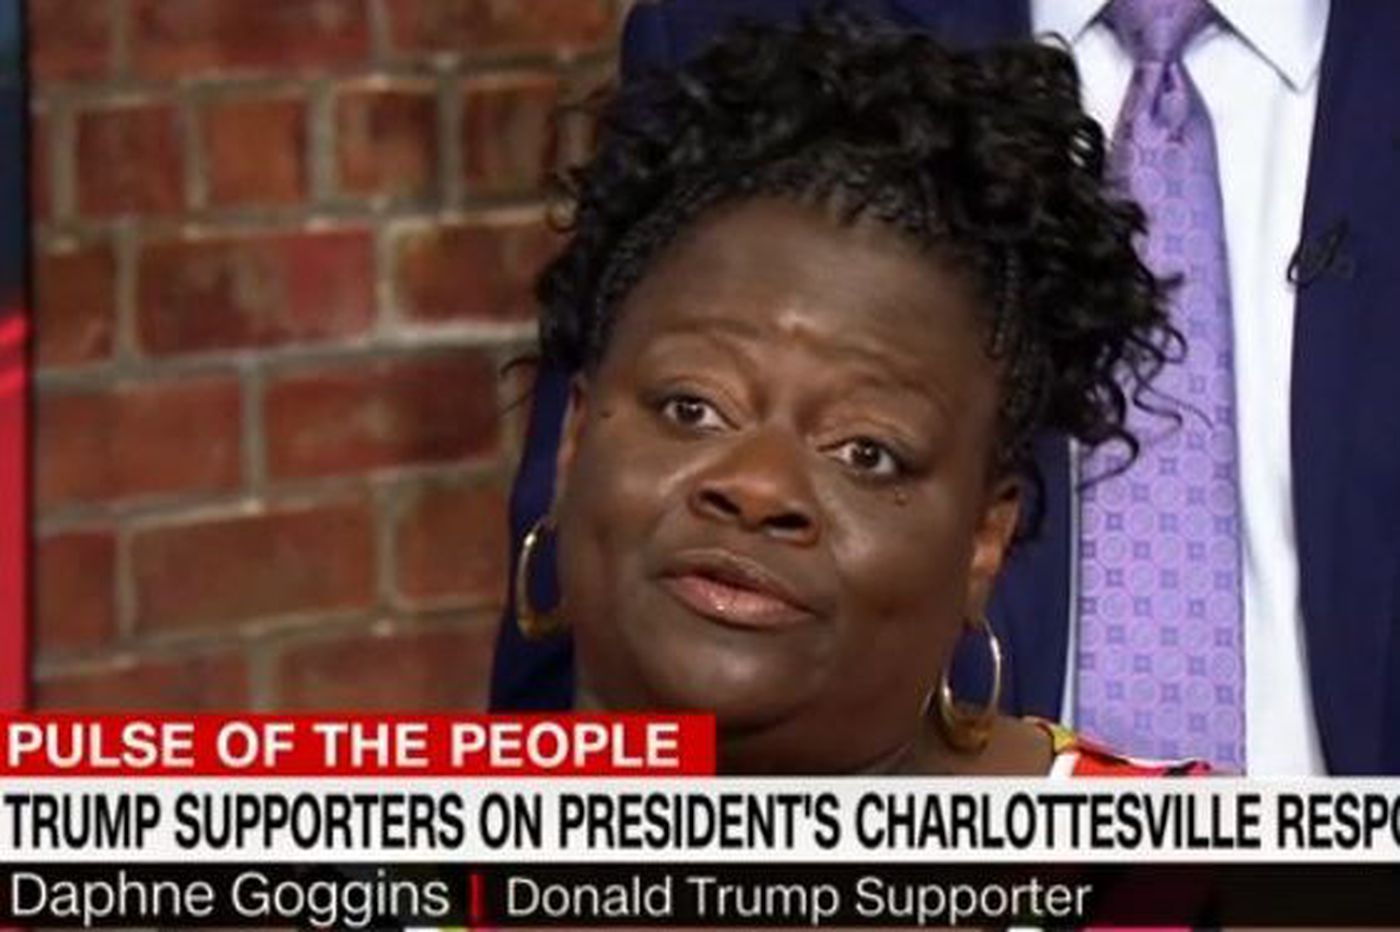 Philly GOP ward leader knocks 'fake news' CNN for probing claim